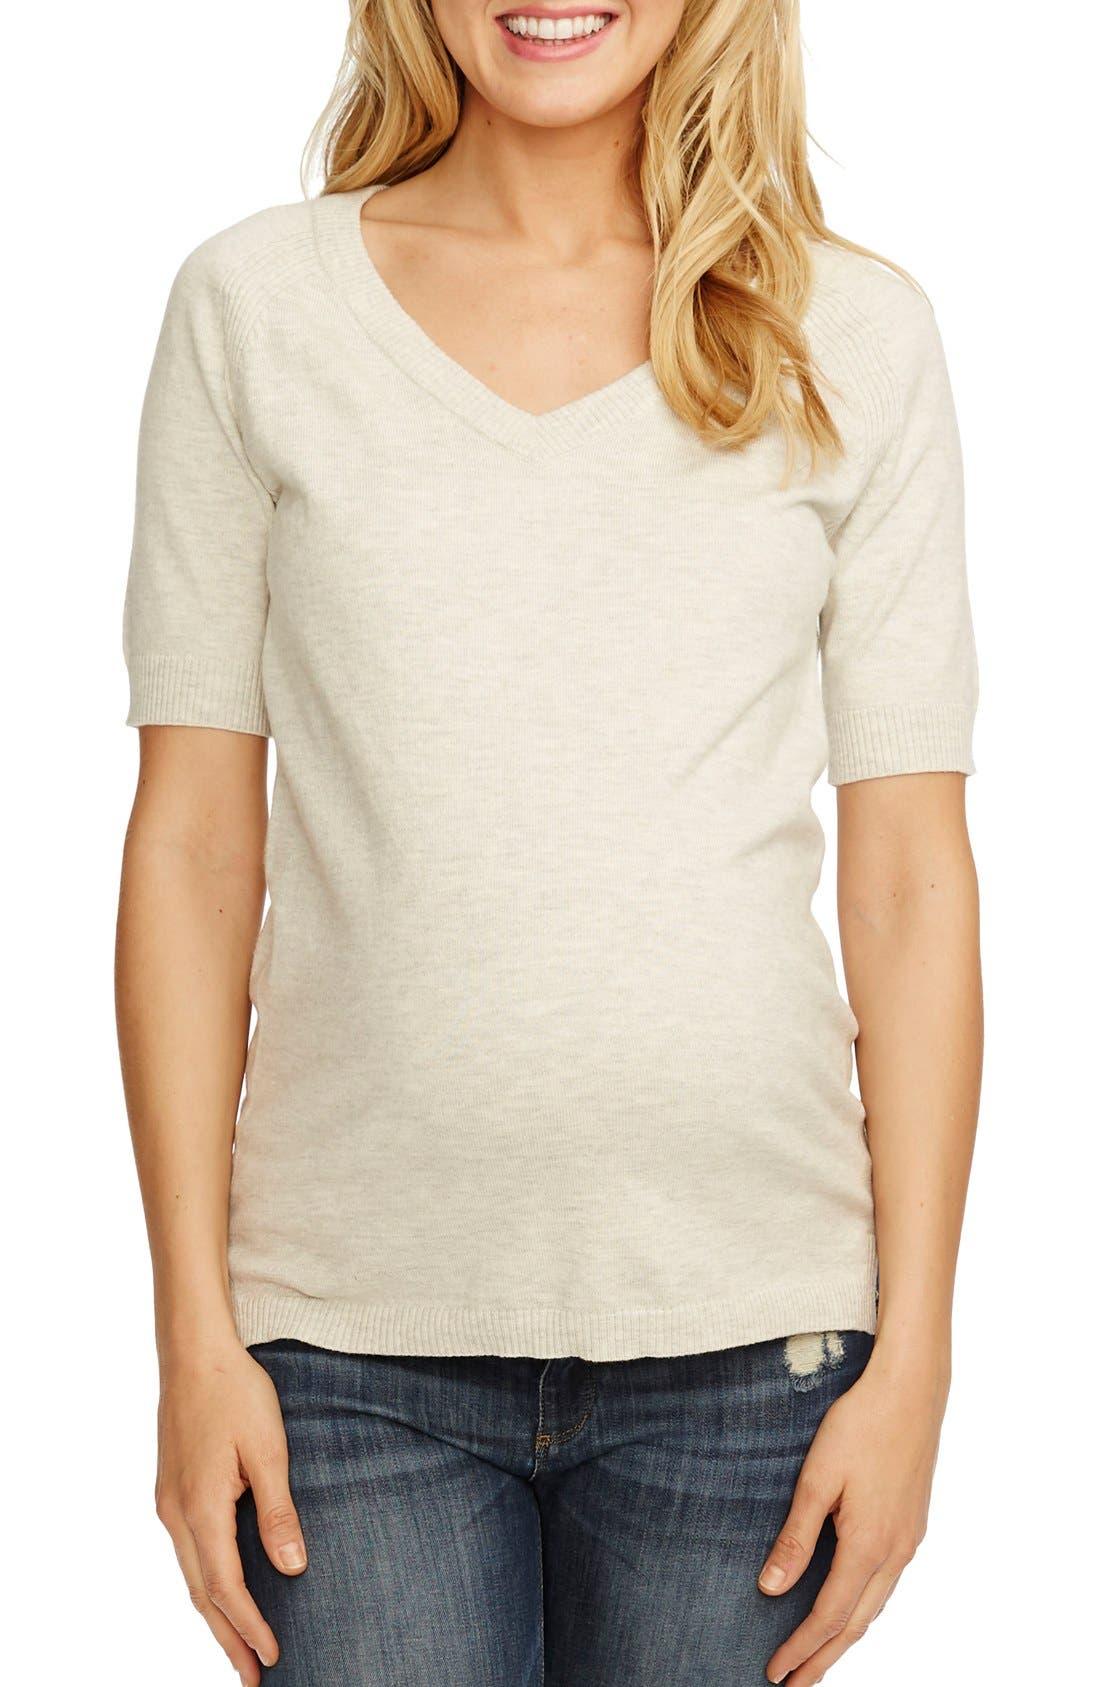 'Avery' V-Neck Maternity Sweater,                         Main,                         color, IVORY HEATHER